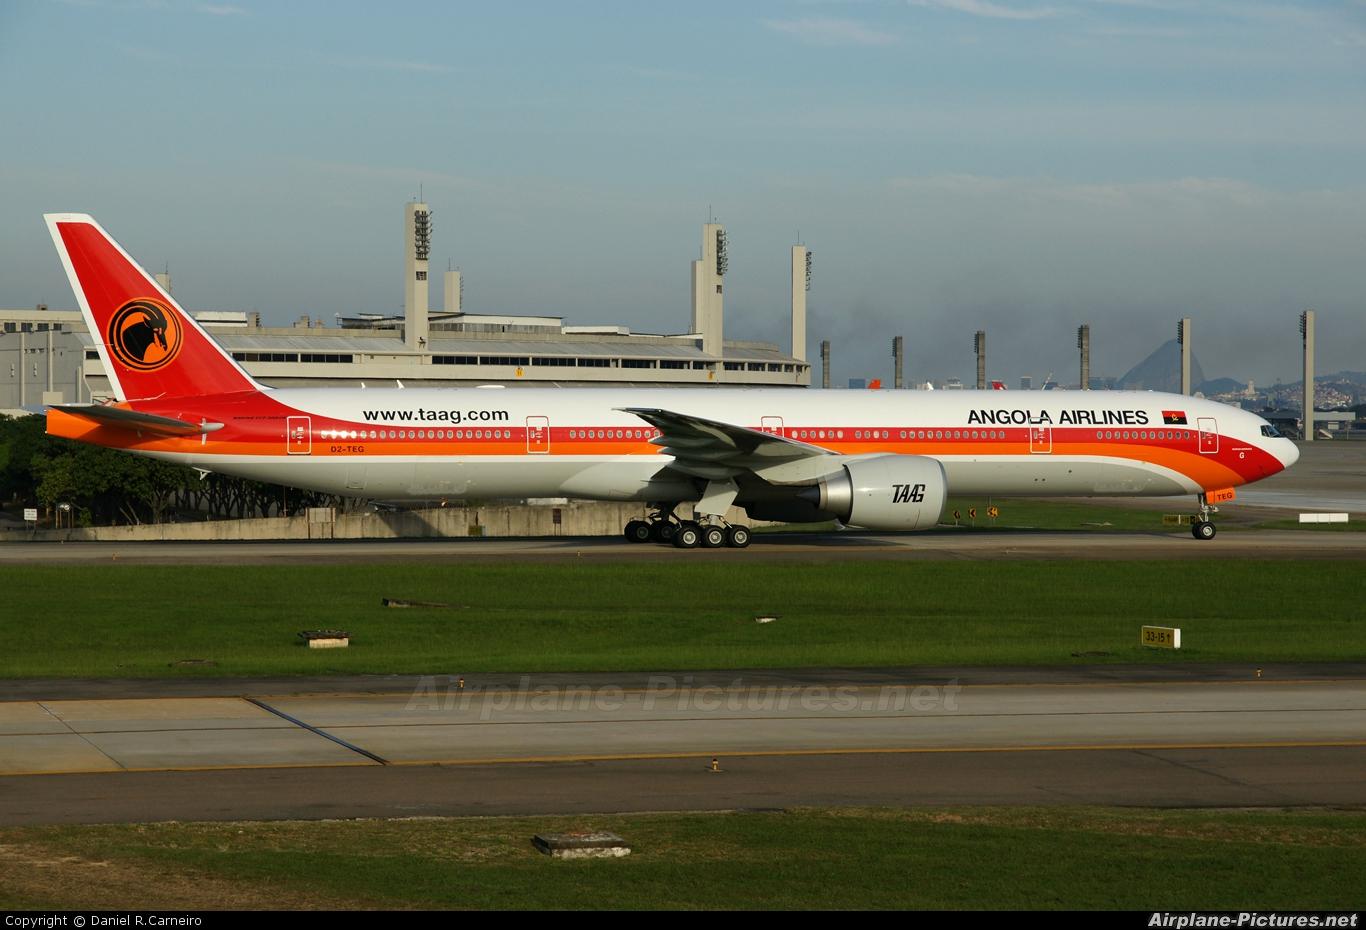 TAAG - Angola Airlines D2-TEG aircraft at Rio de Janeiro/Galeão Intl - Antonio Carlos Jobim